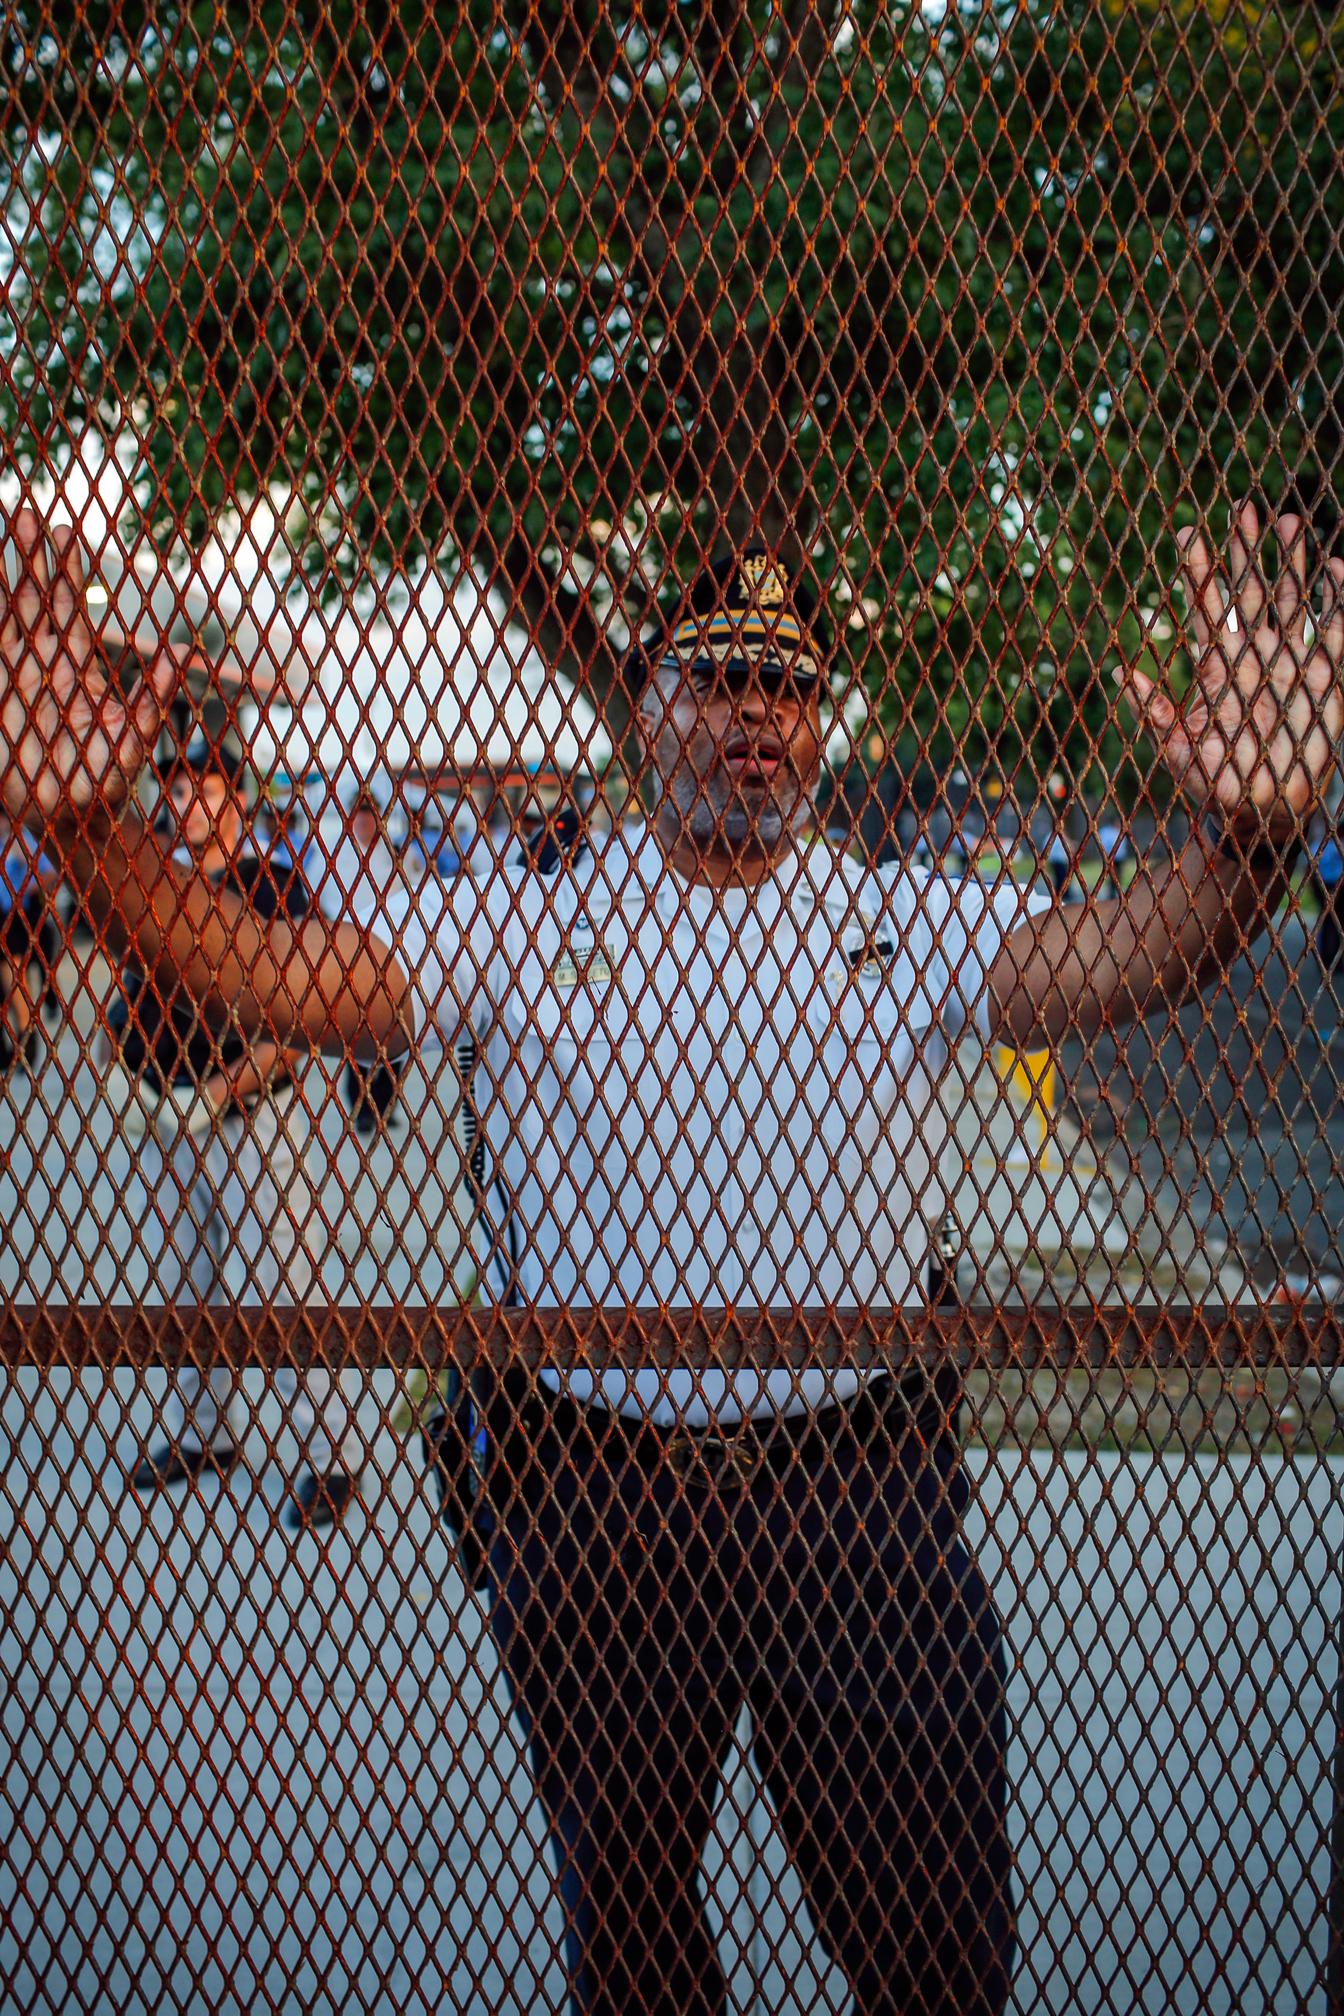 Philadelphia Police Officer Through the Barricade